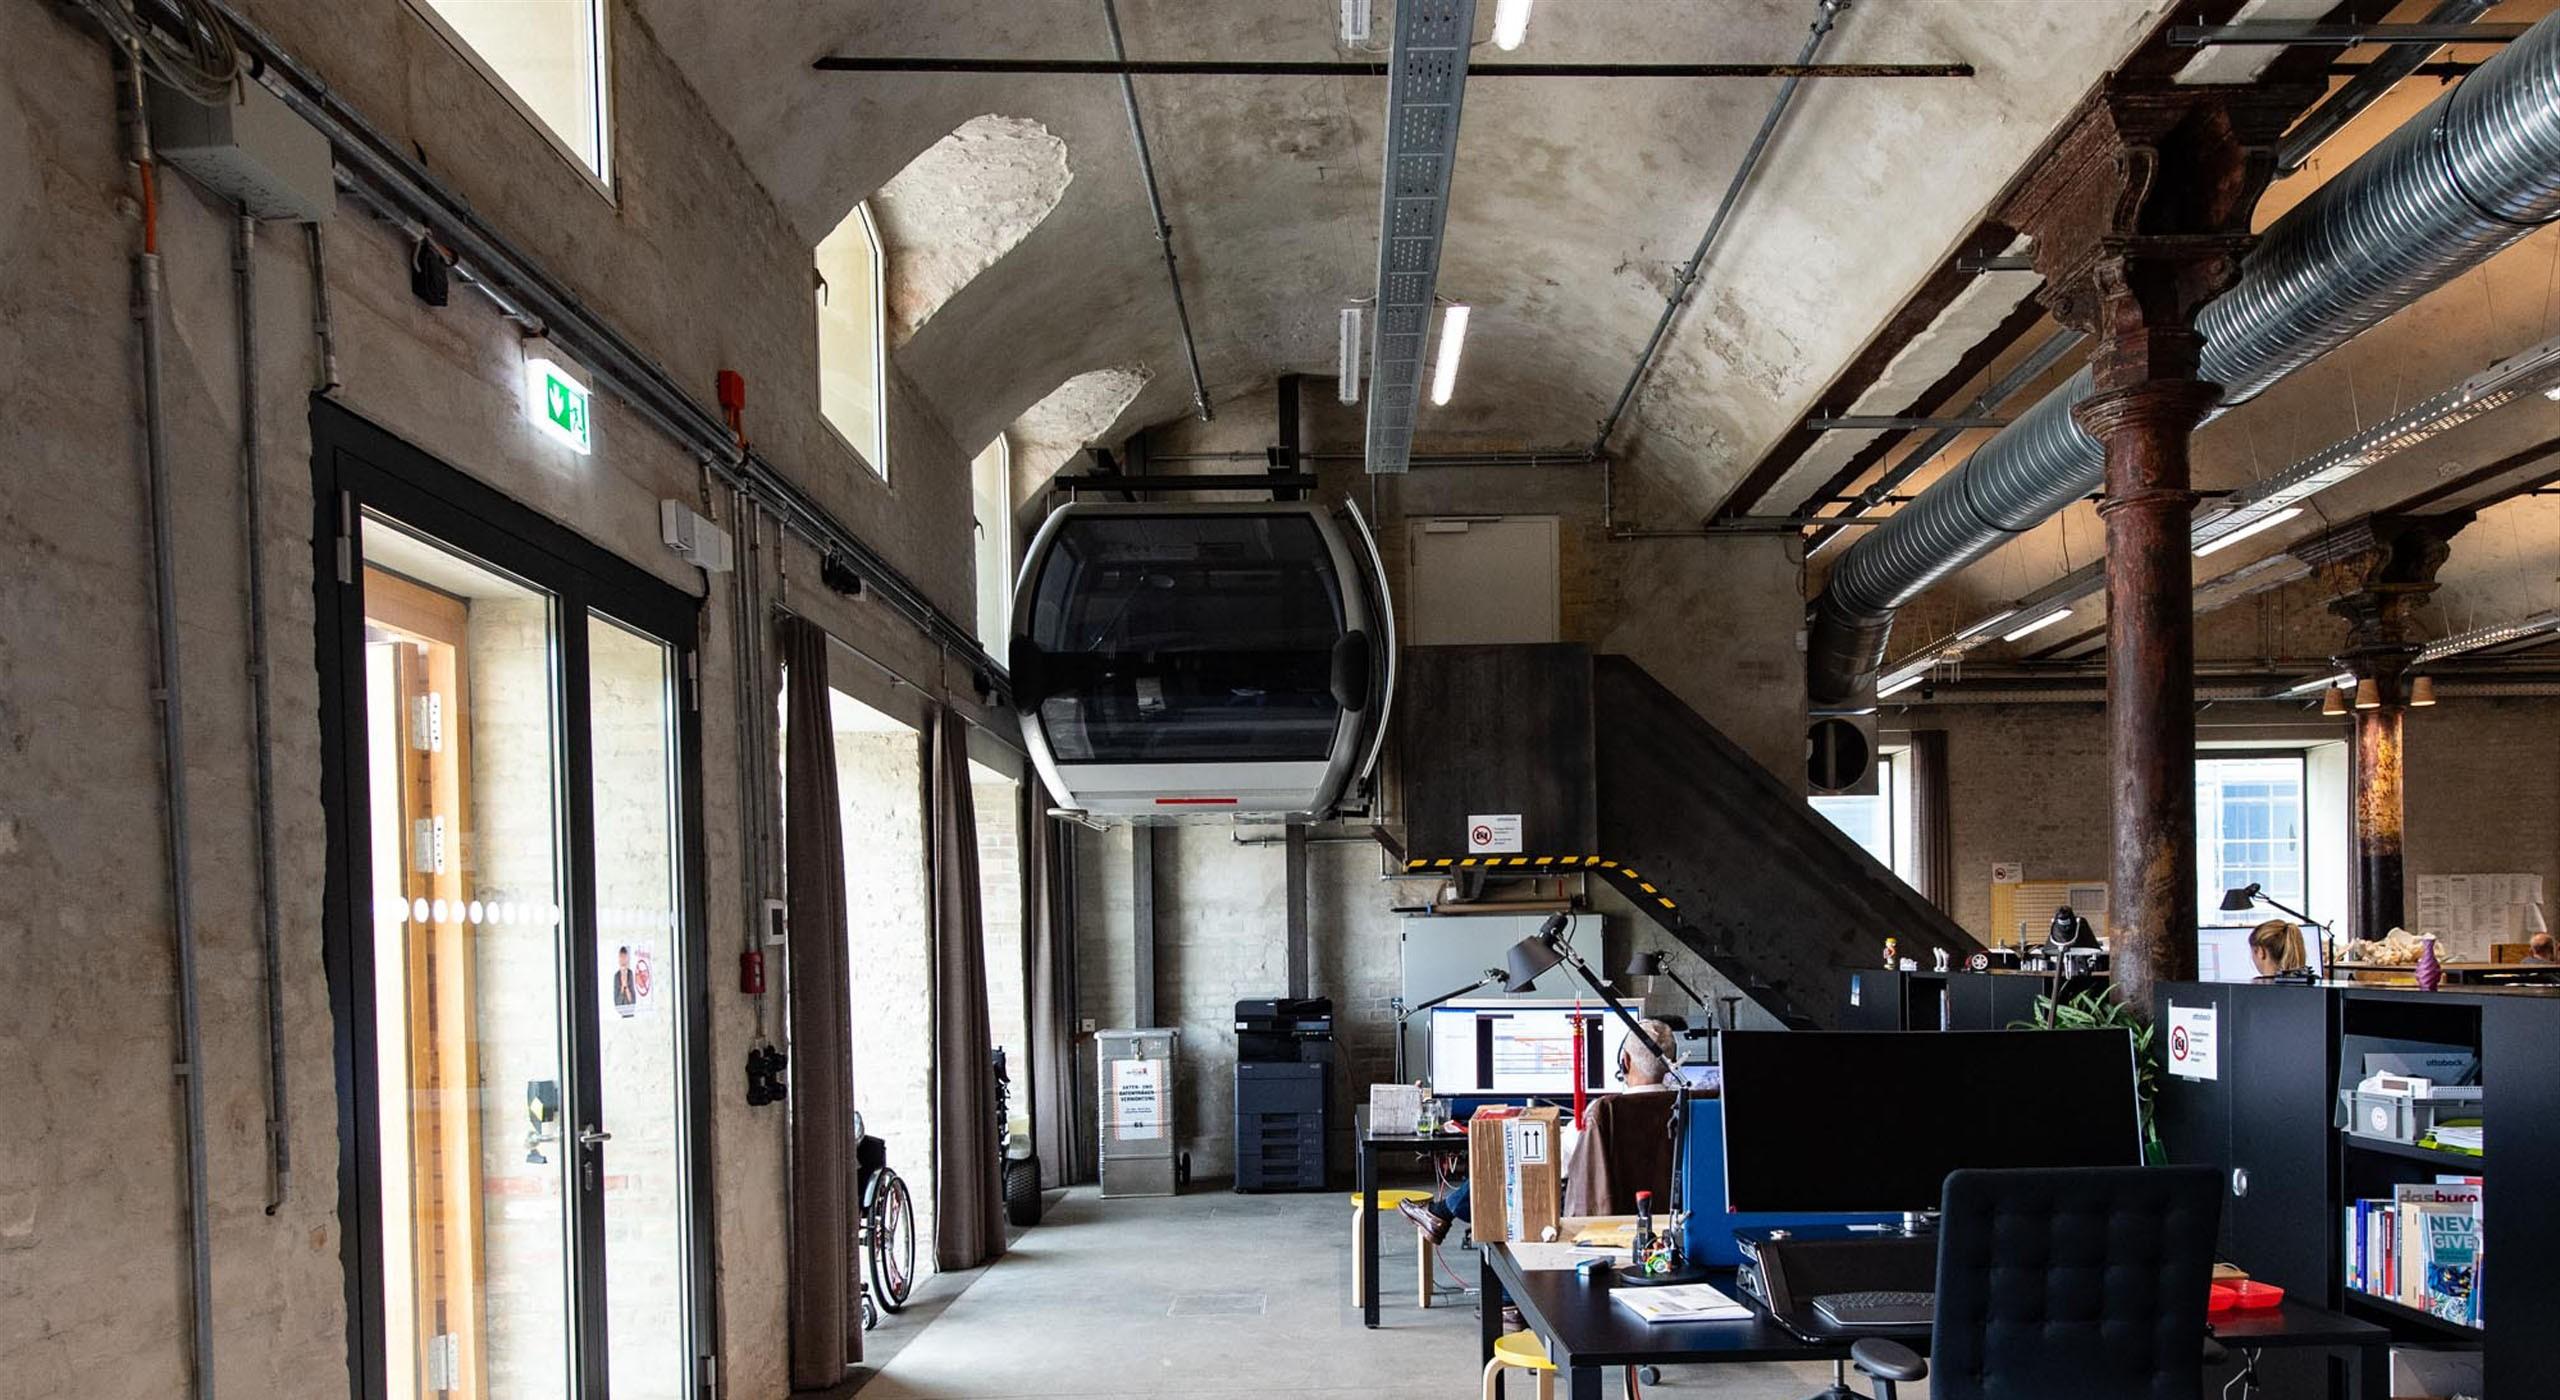 Innenansicht der ehemaligen Bötzow-Brauerei Berlin nach Sanierung © Bernd Blumrich